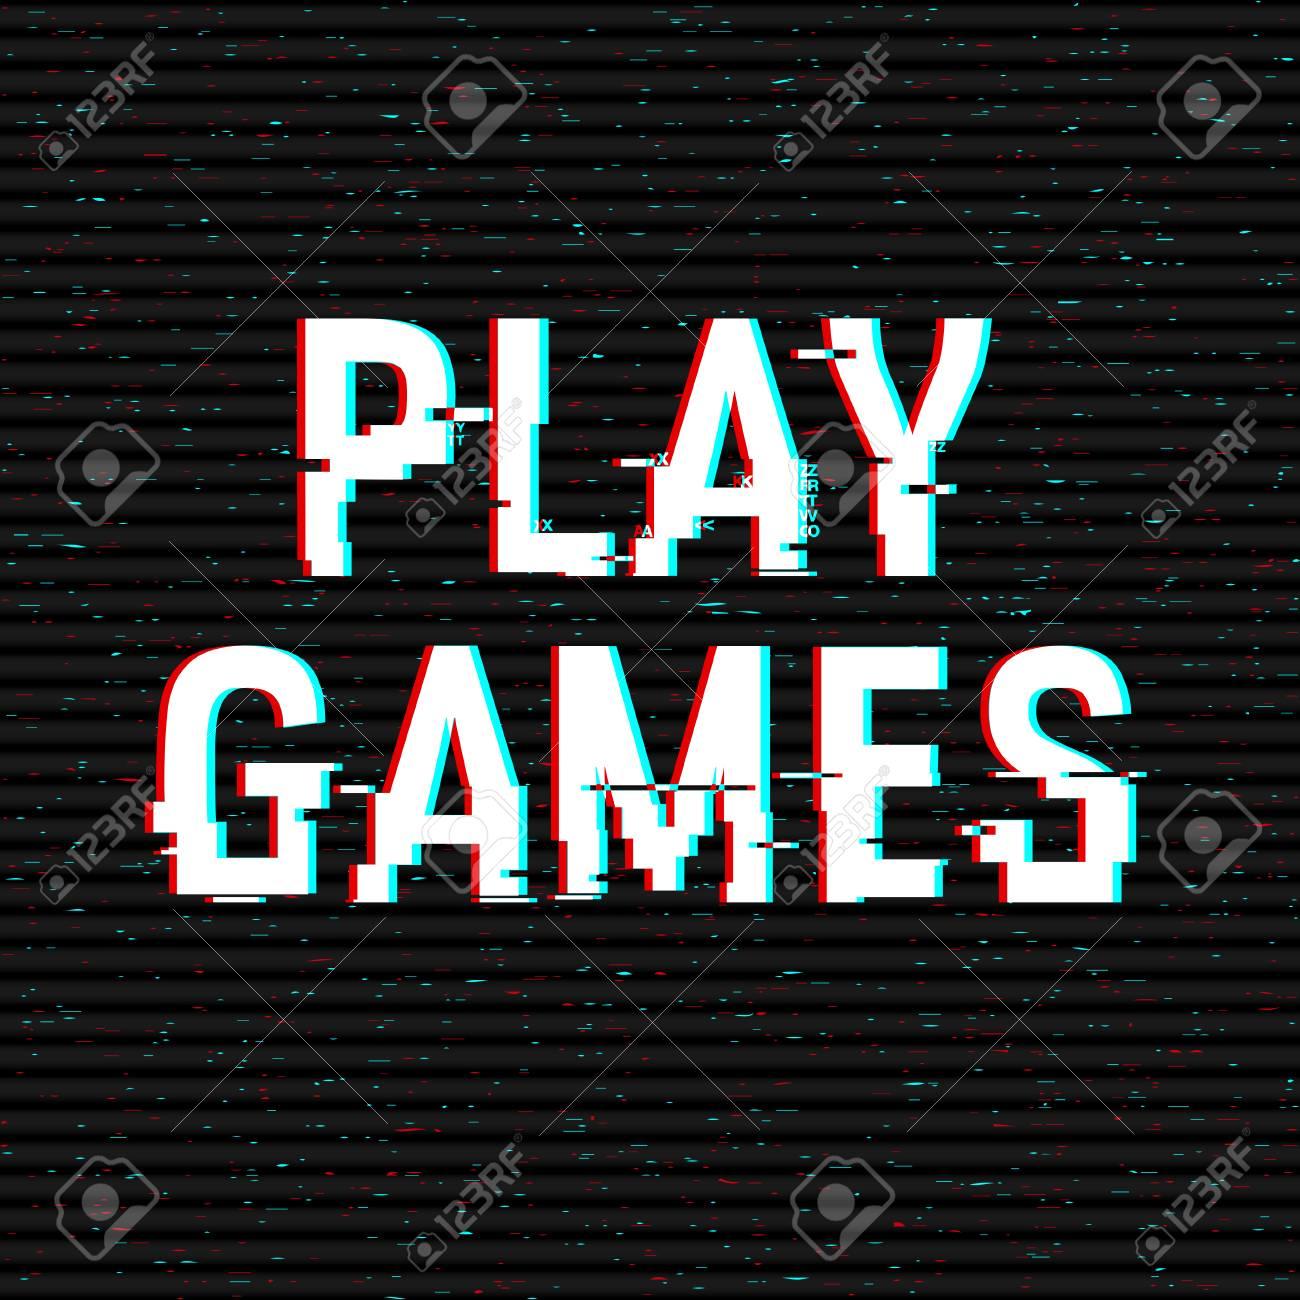 Juega Juegos Glitch Texto. Efecto Anaglifo 3D. Fondo Retro ...